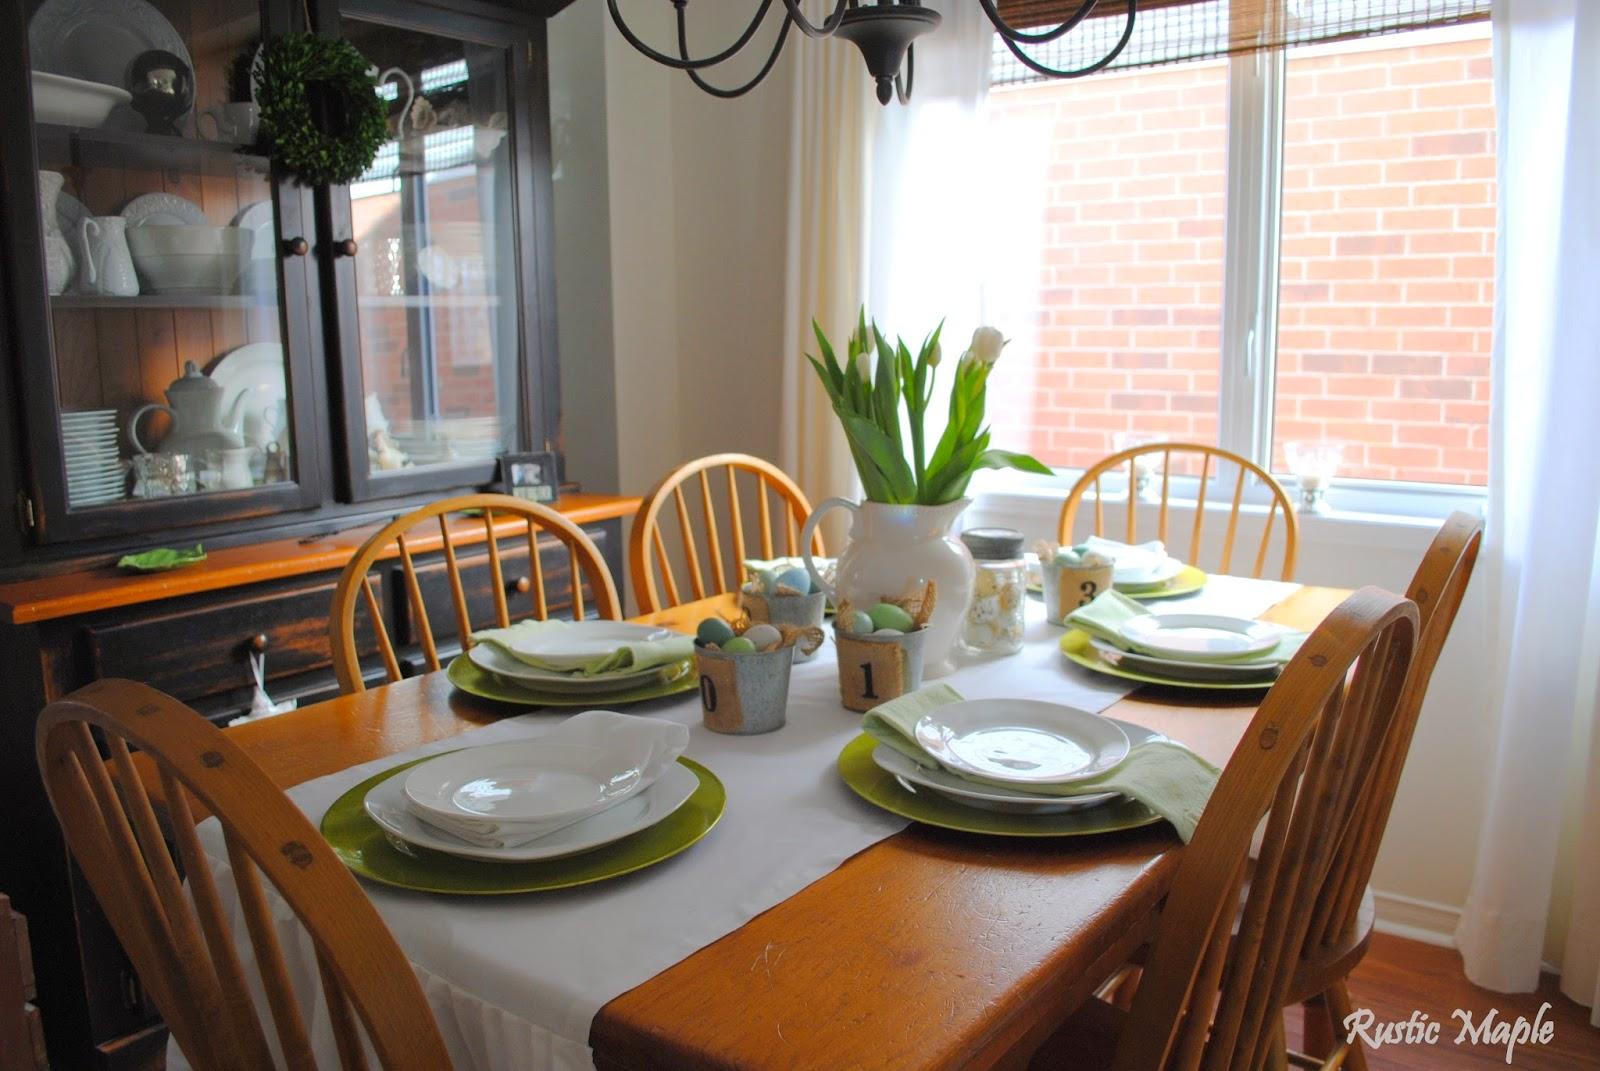 Terrific Dining Room Items Contemporary - Exterior ideas 3D - gaml ...